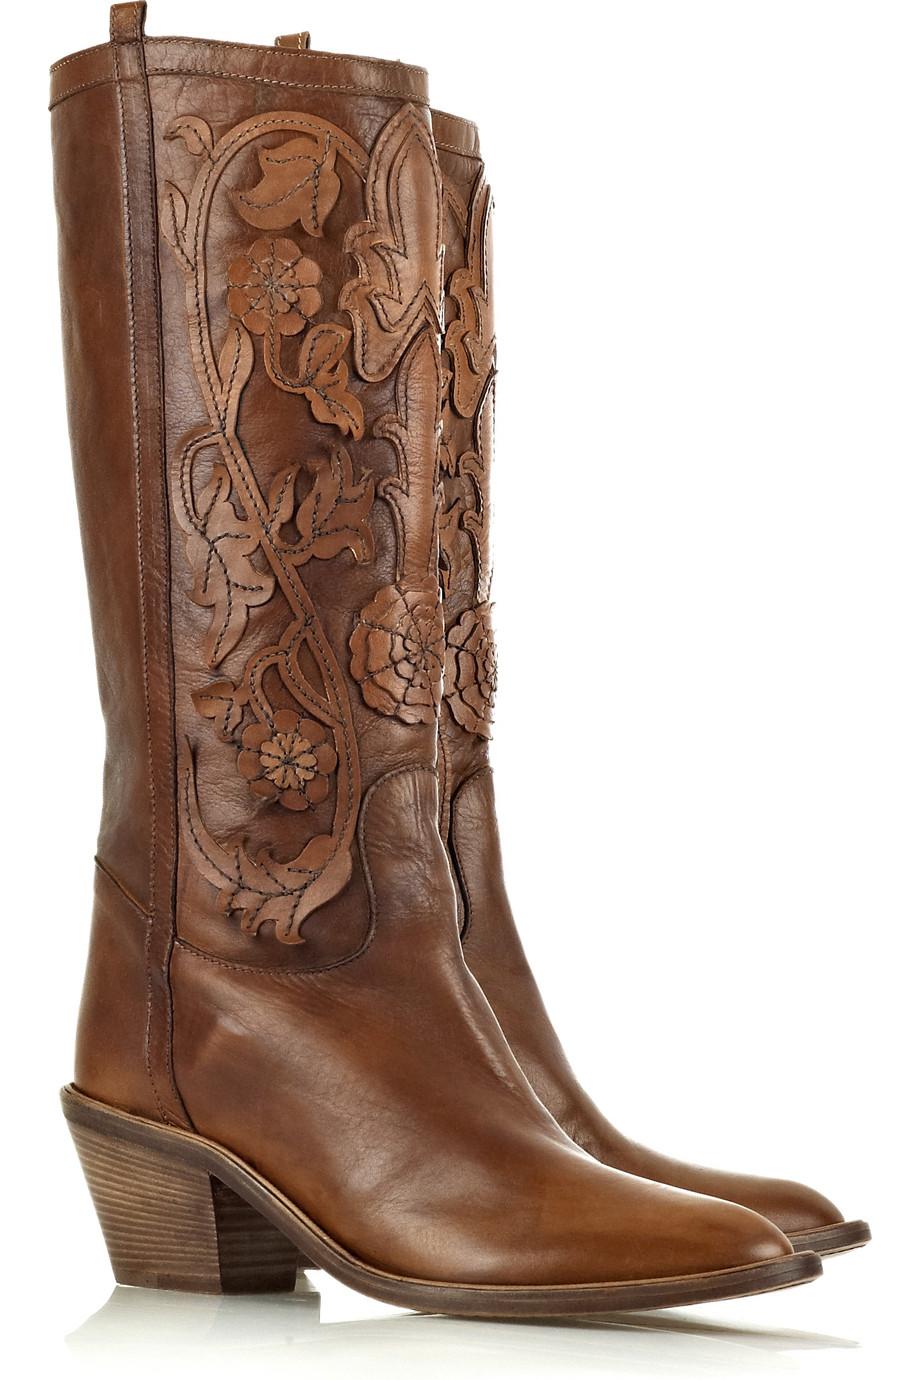 Designer Cowboy Boots - Boot 2017